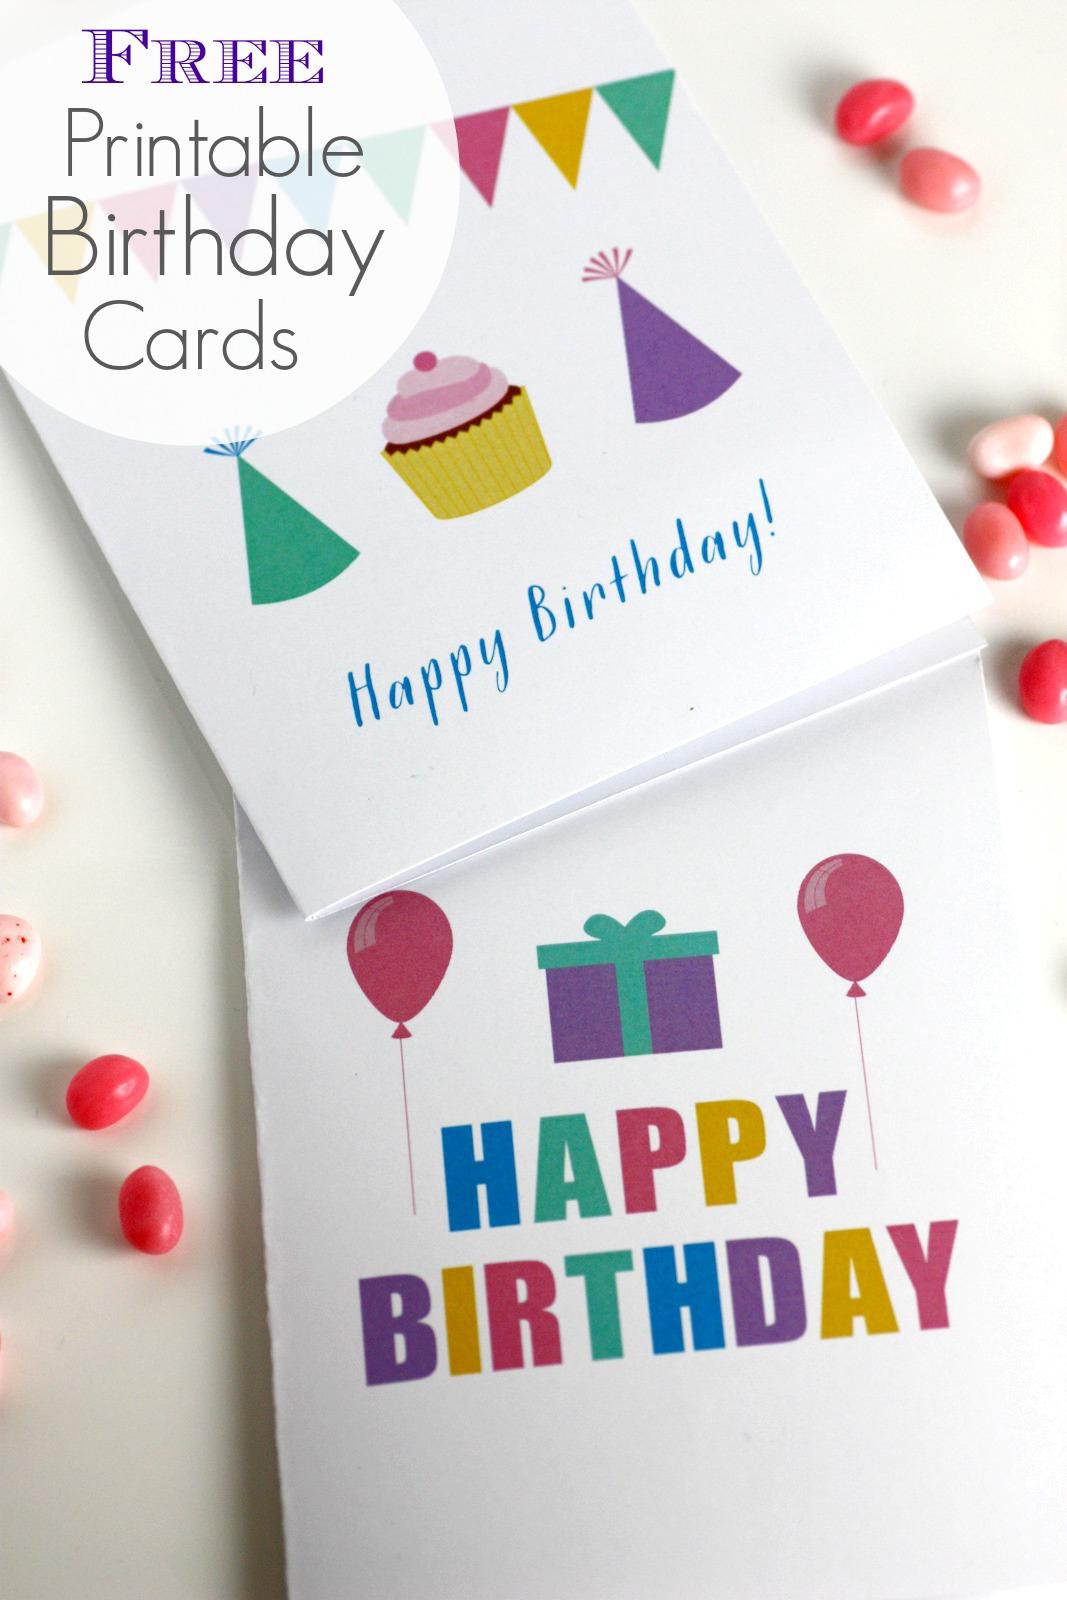 Free Printable Greeting Cards No Registration   Download Them Or Print - Free Printable Greeting Cards No Sign Up